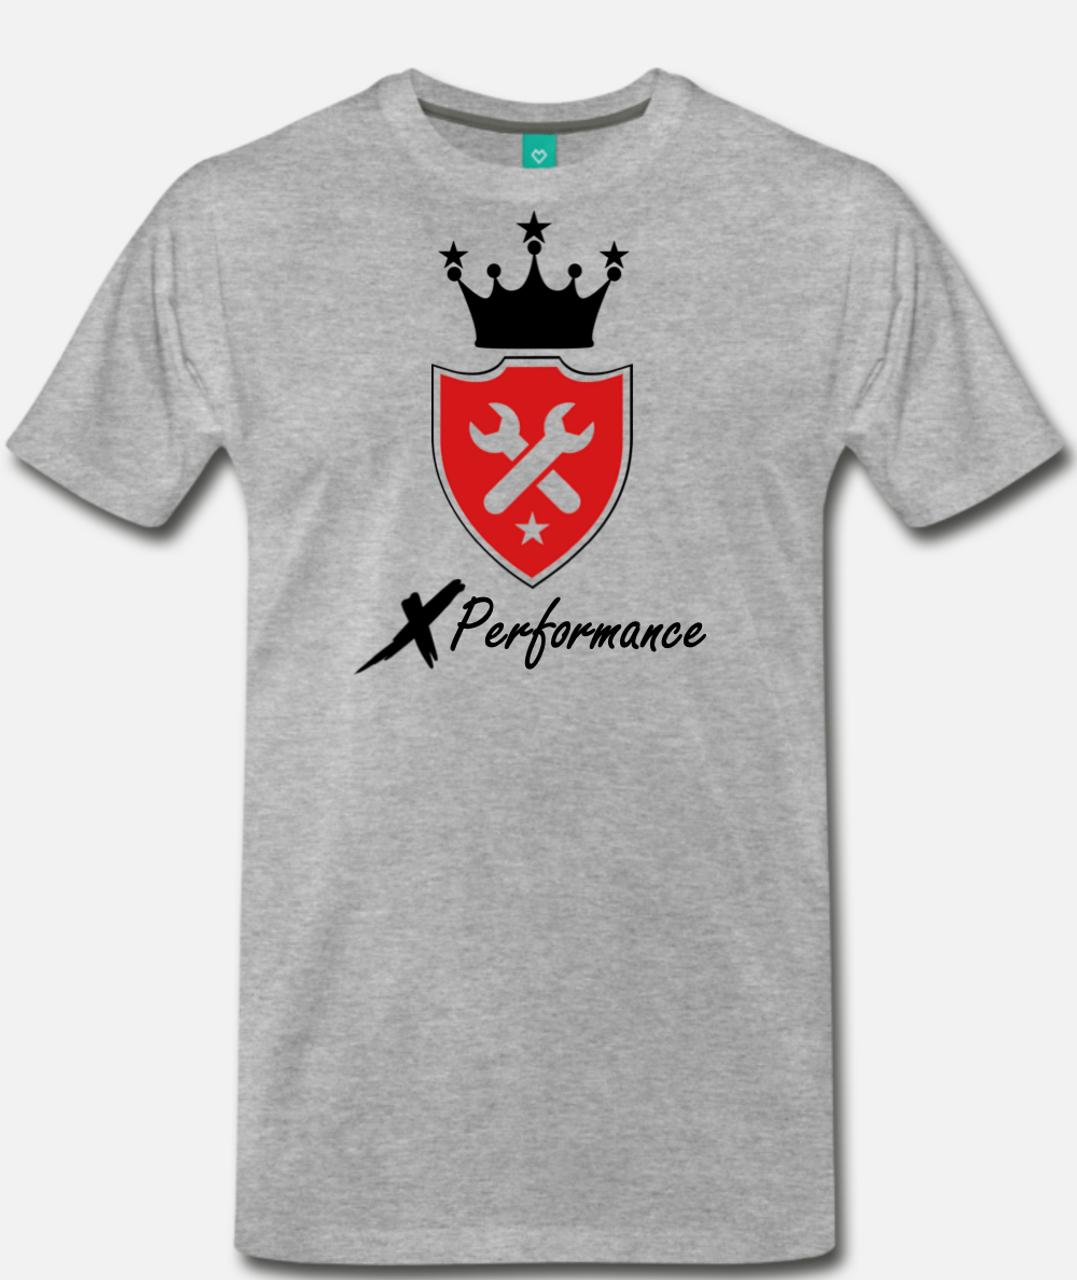 XPerformance T Shirt